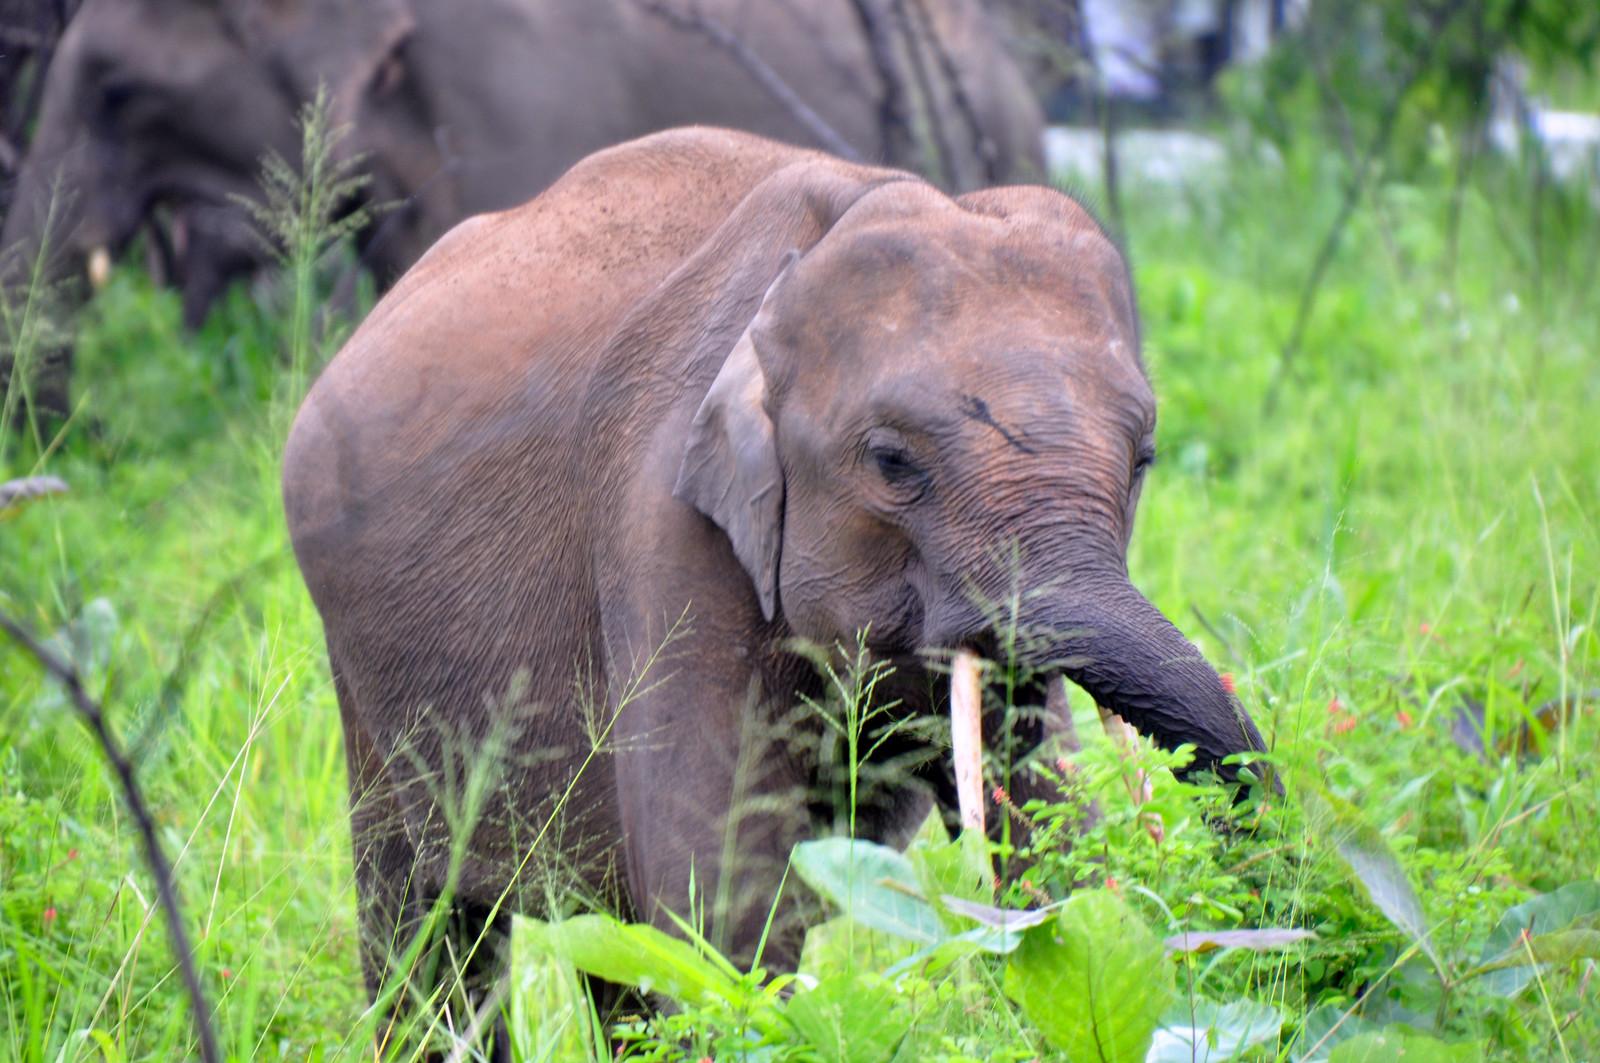 VER ELEFANTES SALVAJES EN SRI LANKA ver elefantes salvajes en sri lanka - 46922003392 0e4ec6e93a h - Ver elefantes salvajes en Sri Lanka